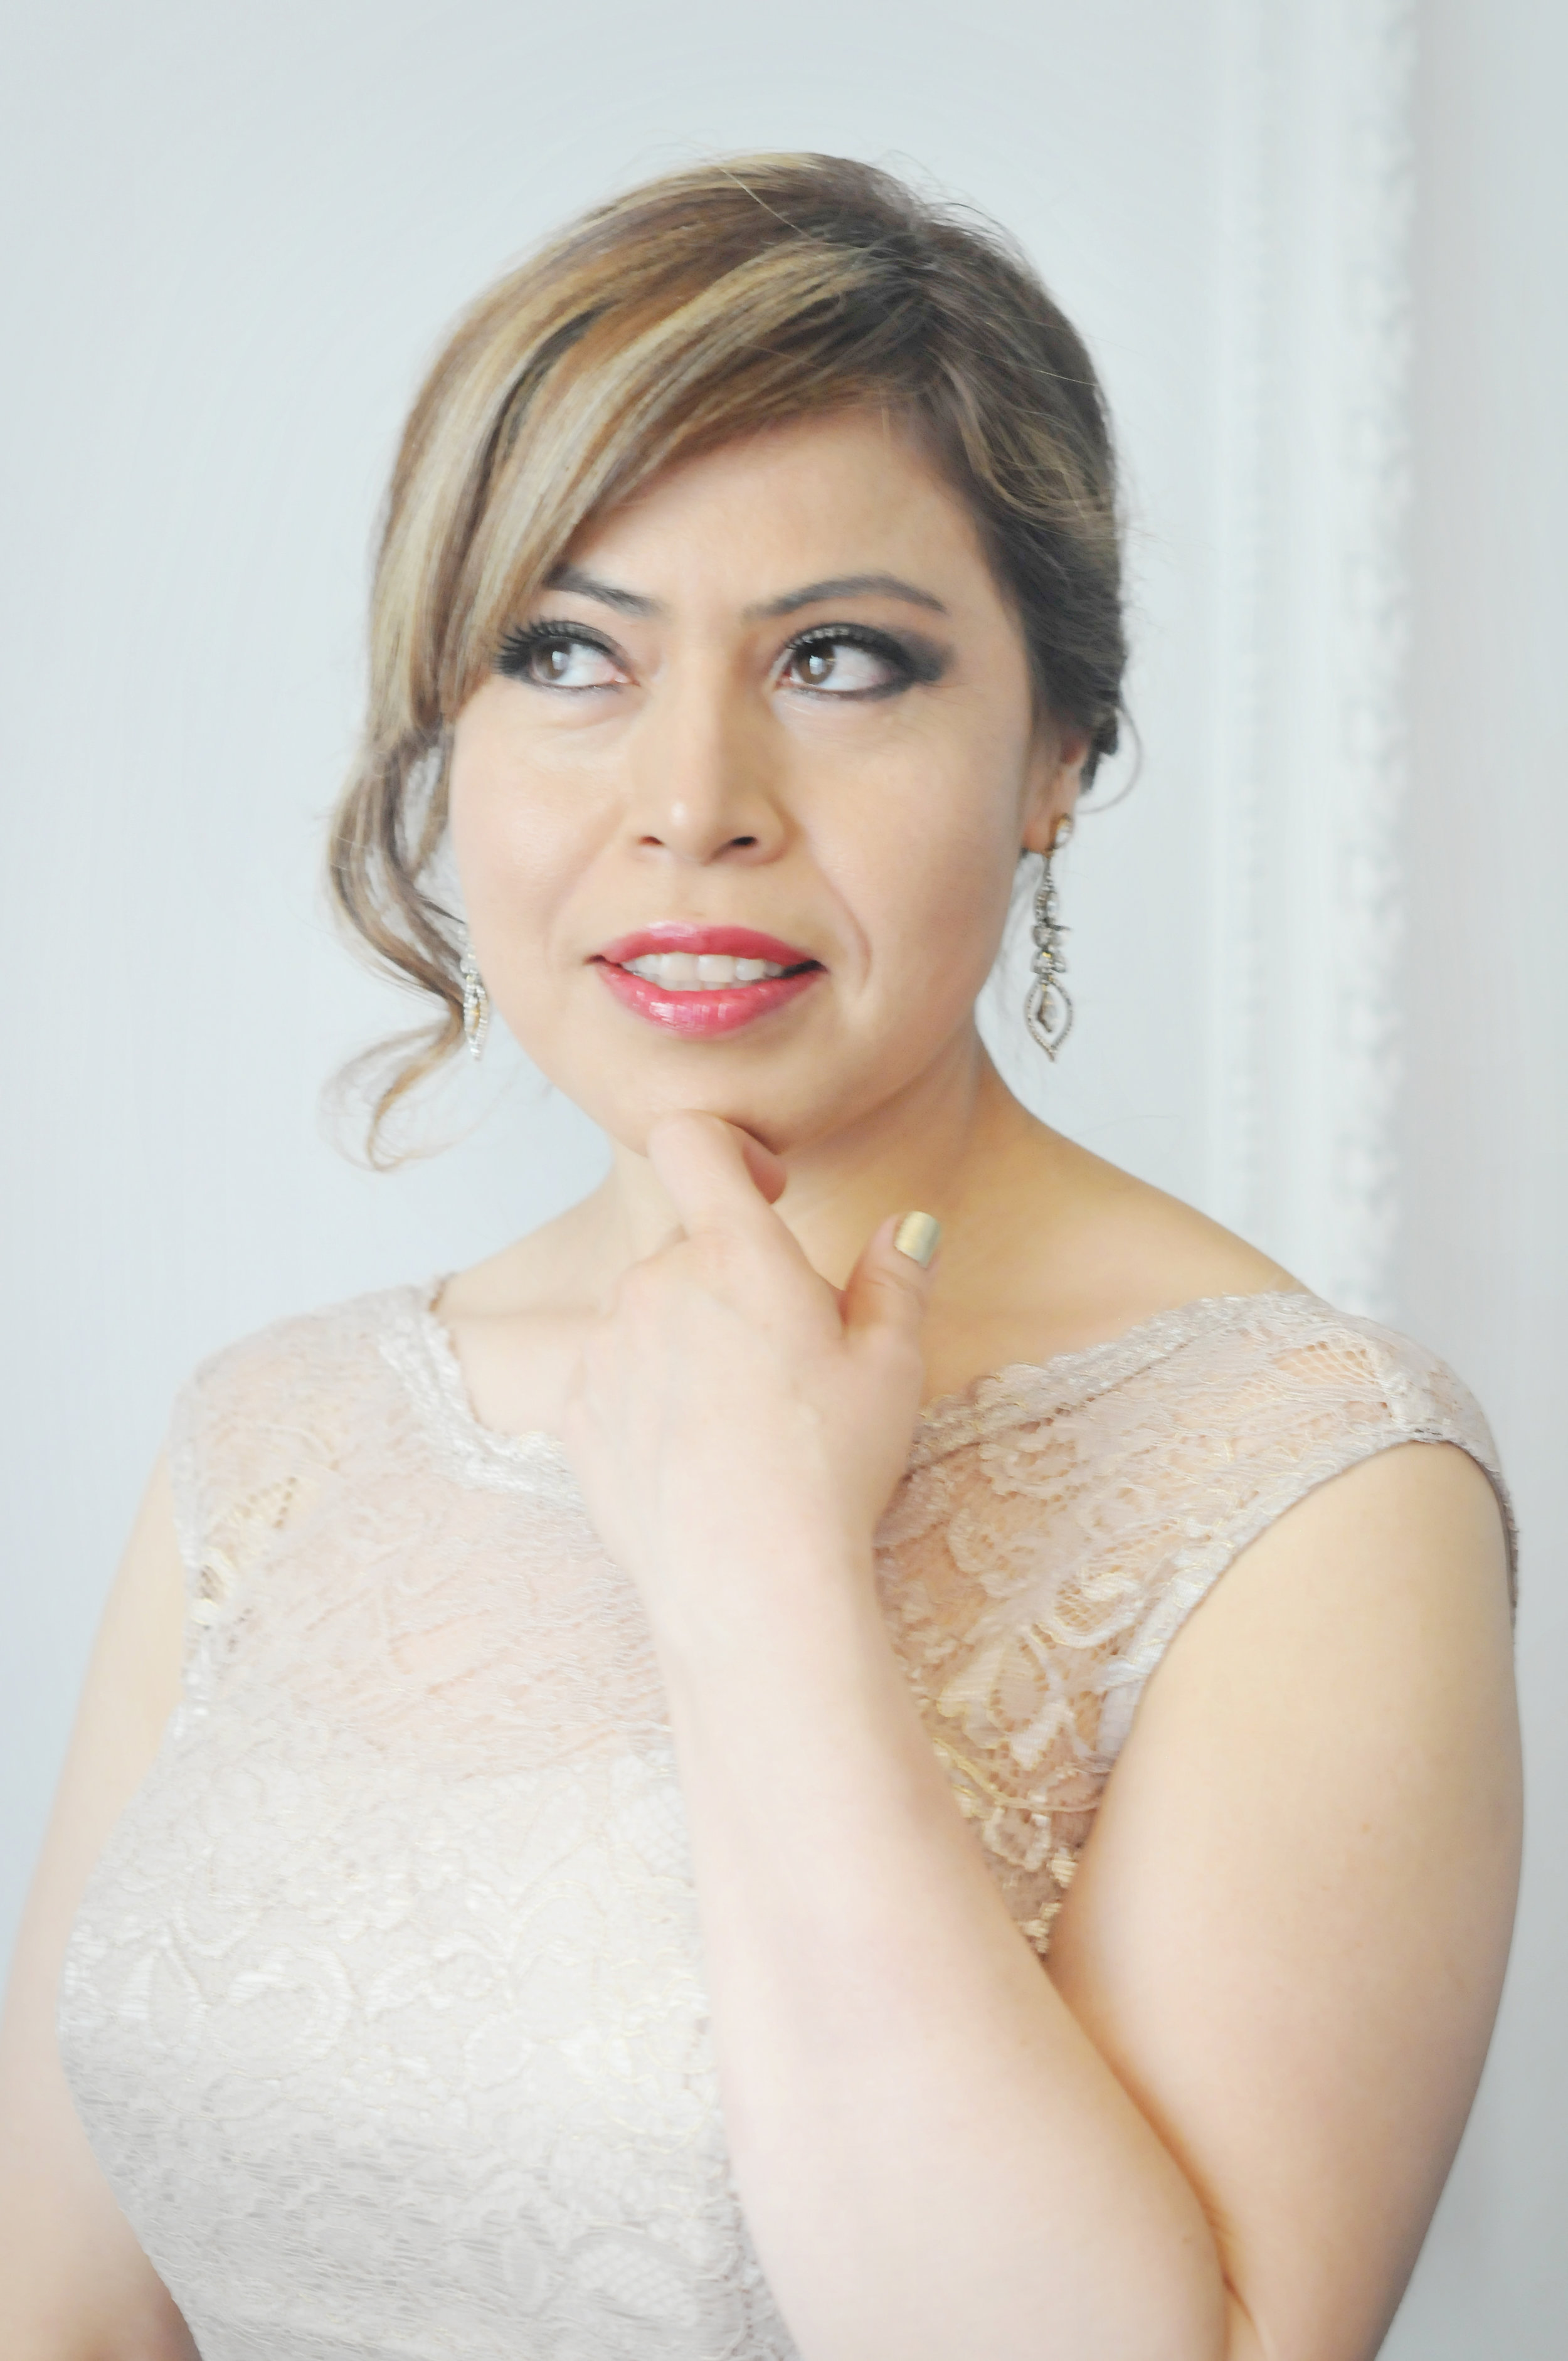 Partovi Wedding 2208 by maria pablo.jpg